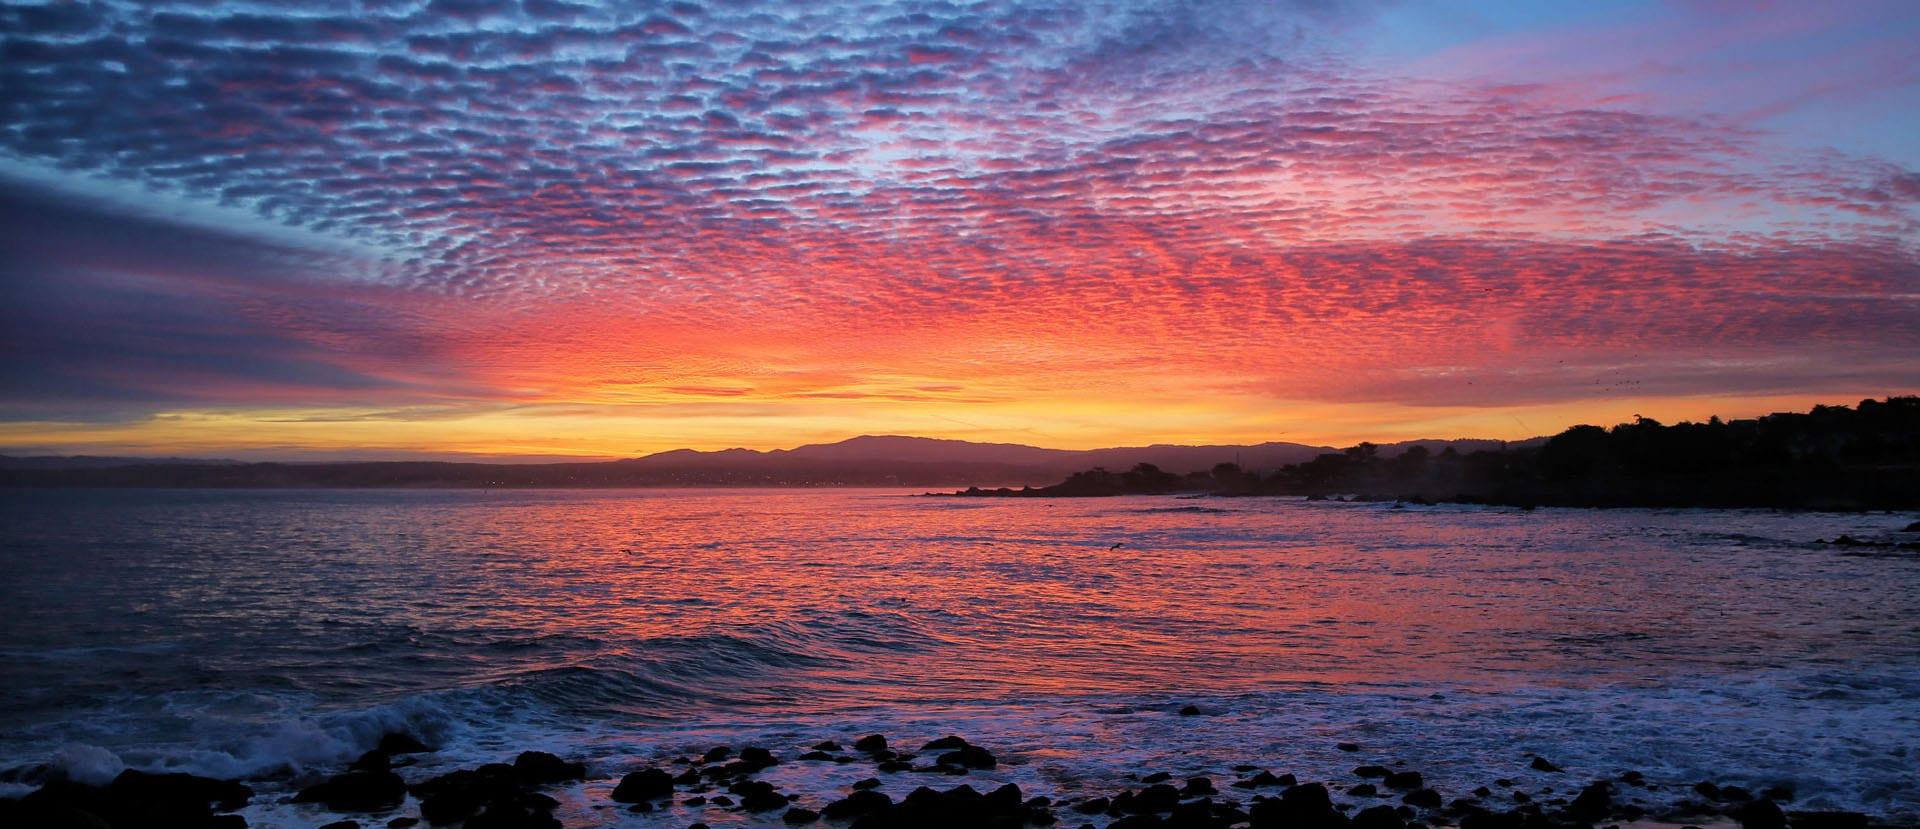 Gulf of Chiriqui sunset